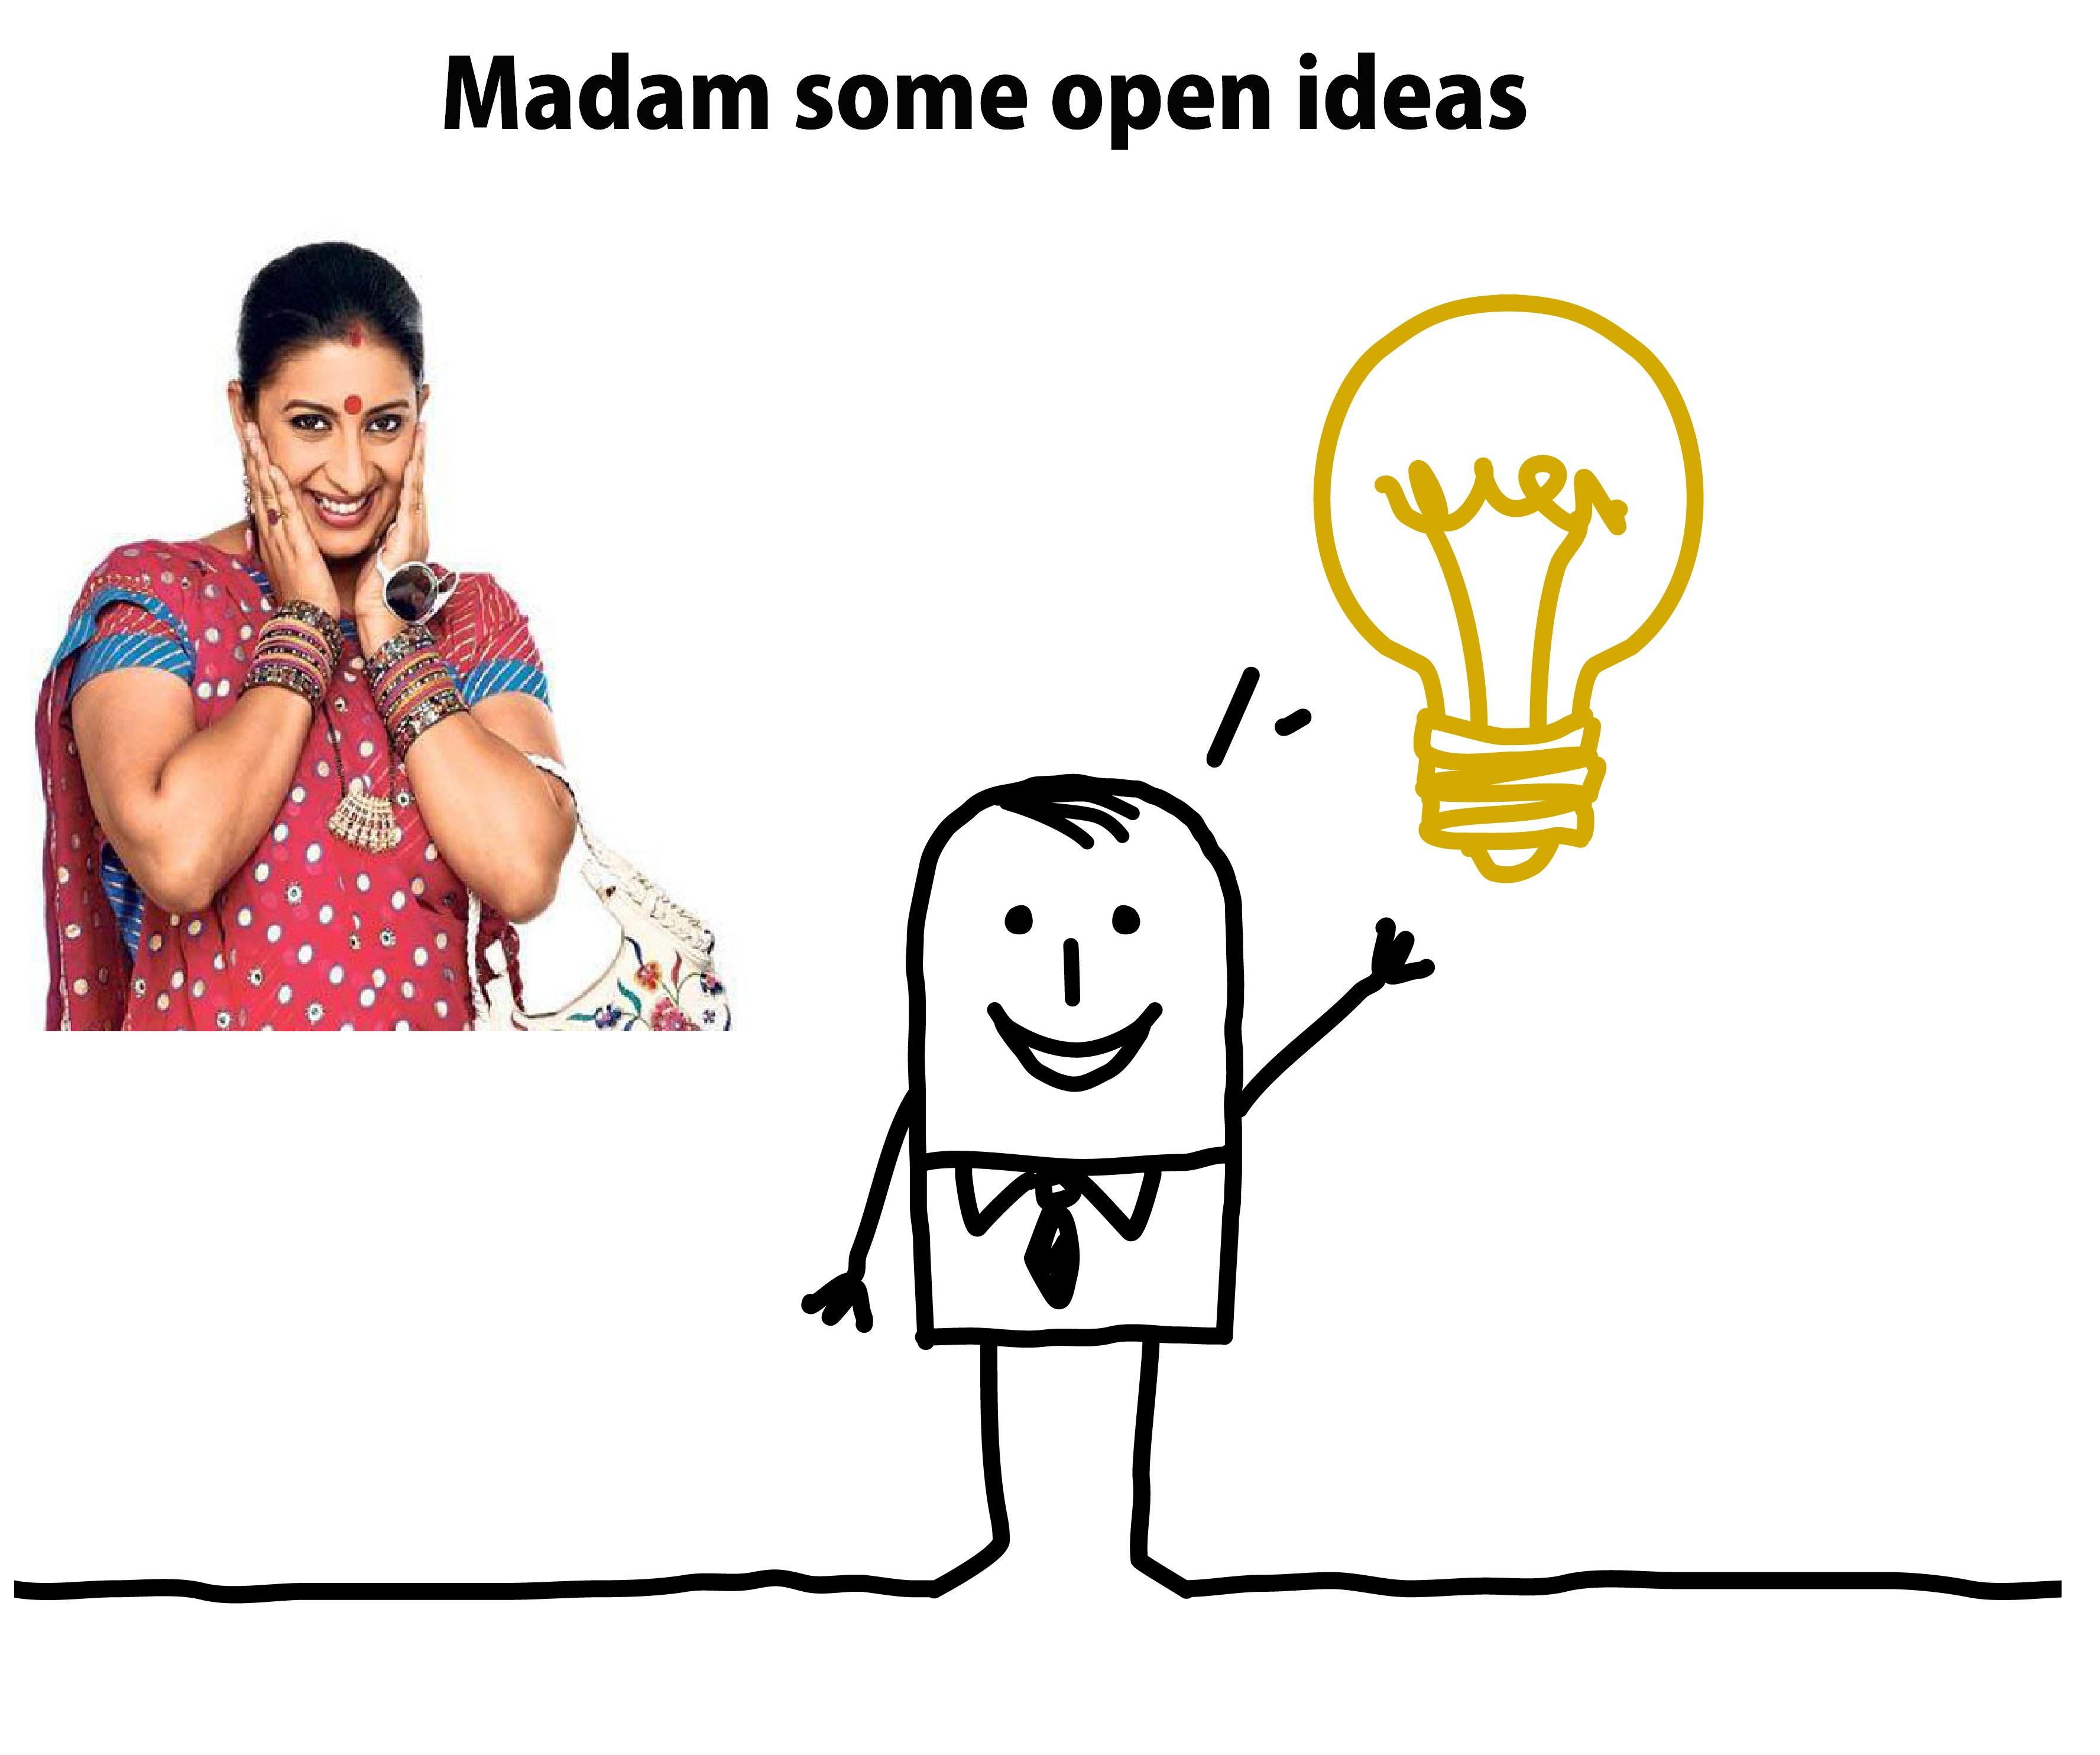 Letter to Smriti Irani: Madam, some open ideas for you!